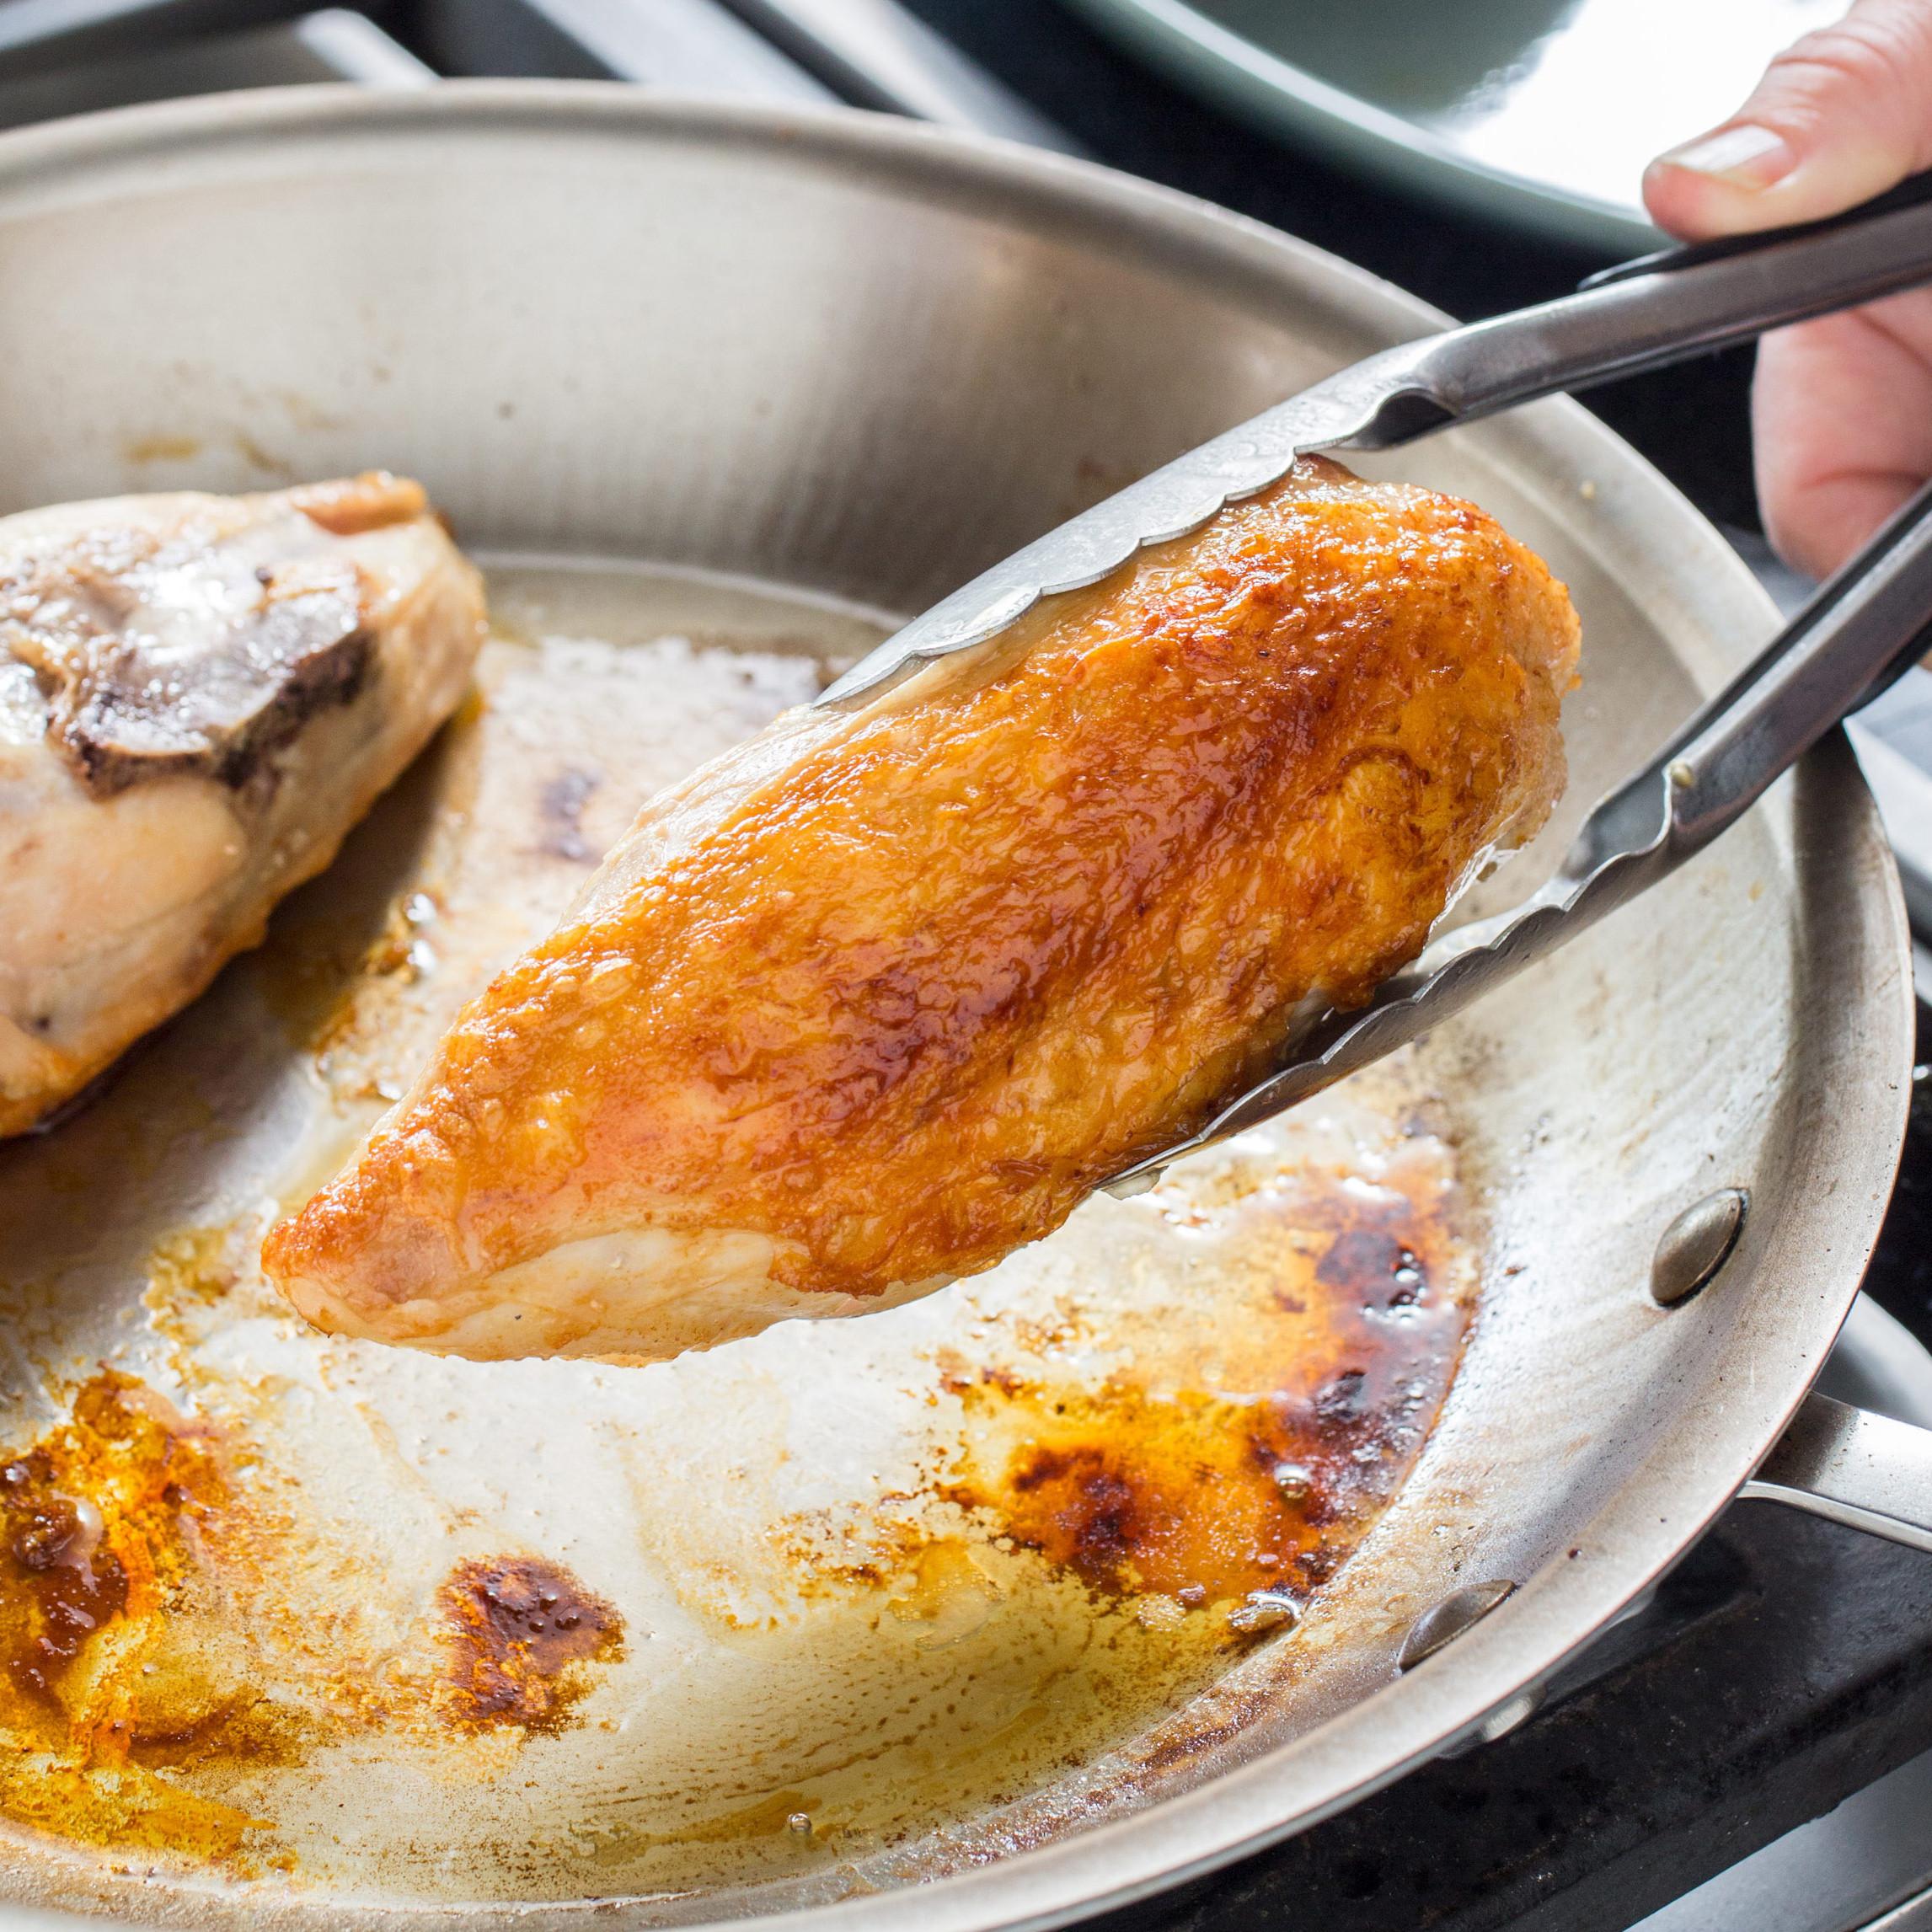 Roasted Bone In Chicken Breast  Roasted Bone In Chicken Breasts for Two